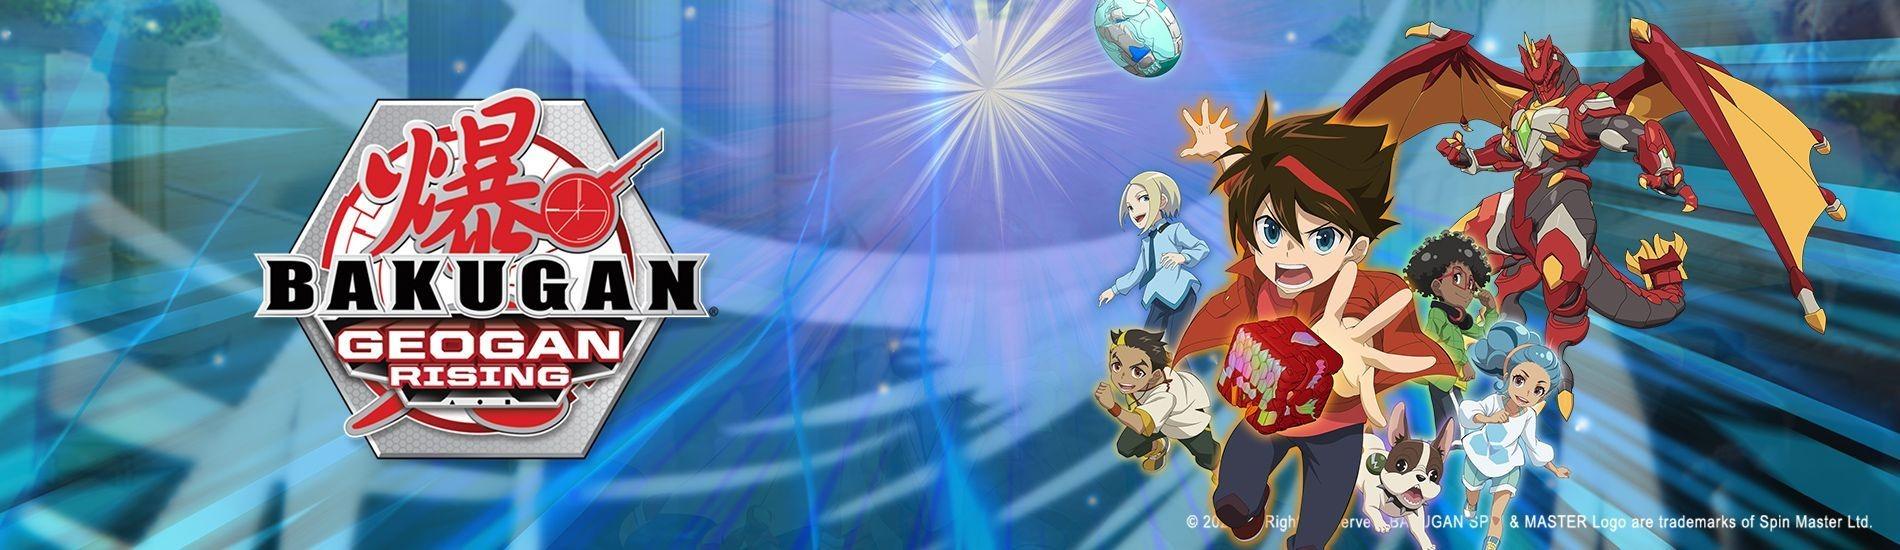 Bakugan en streaming sur Gulli Replay